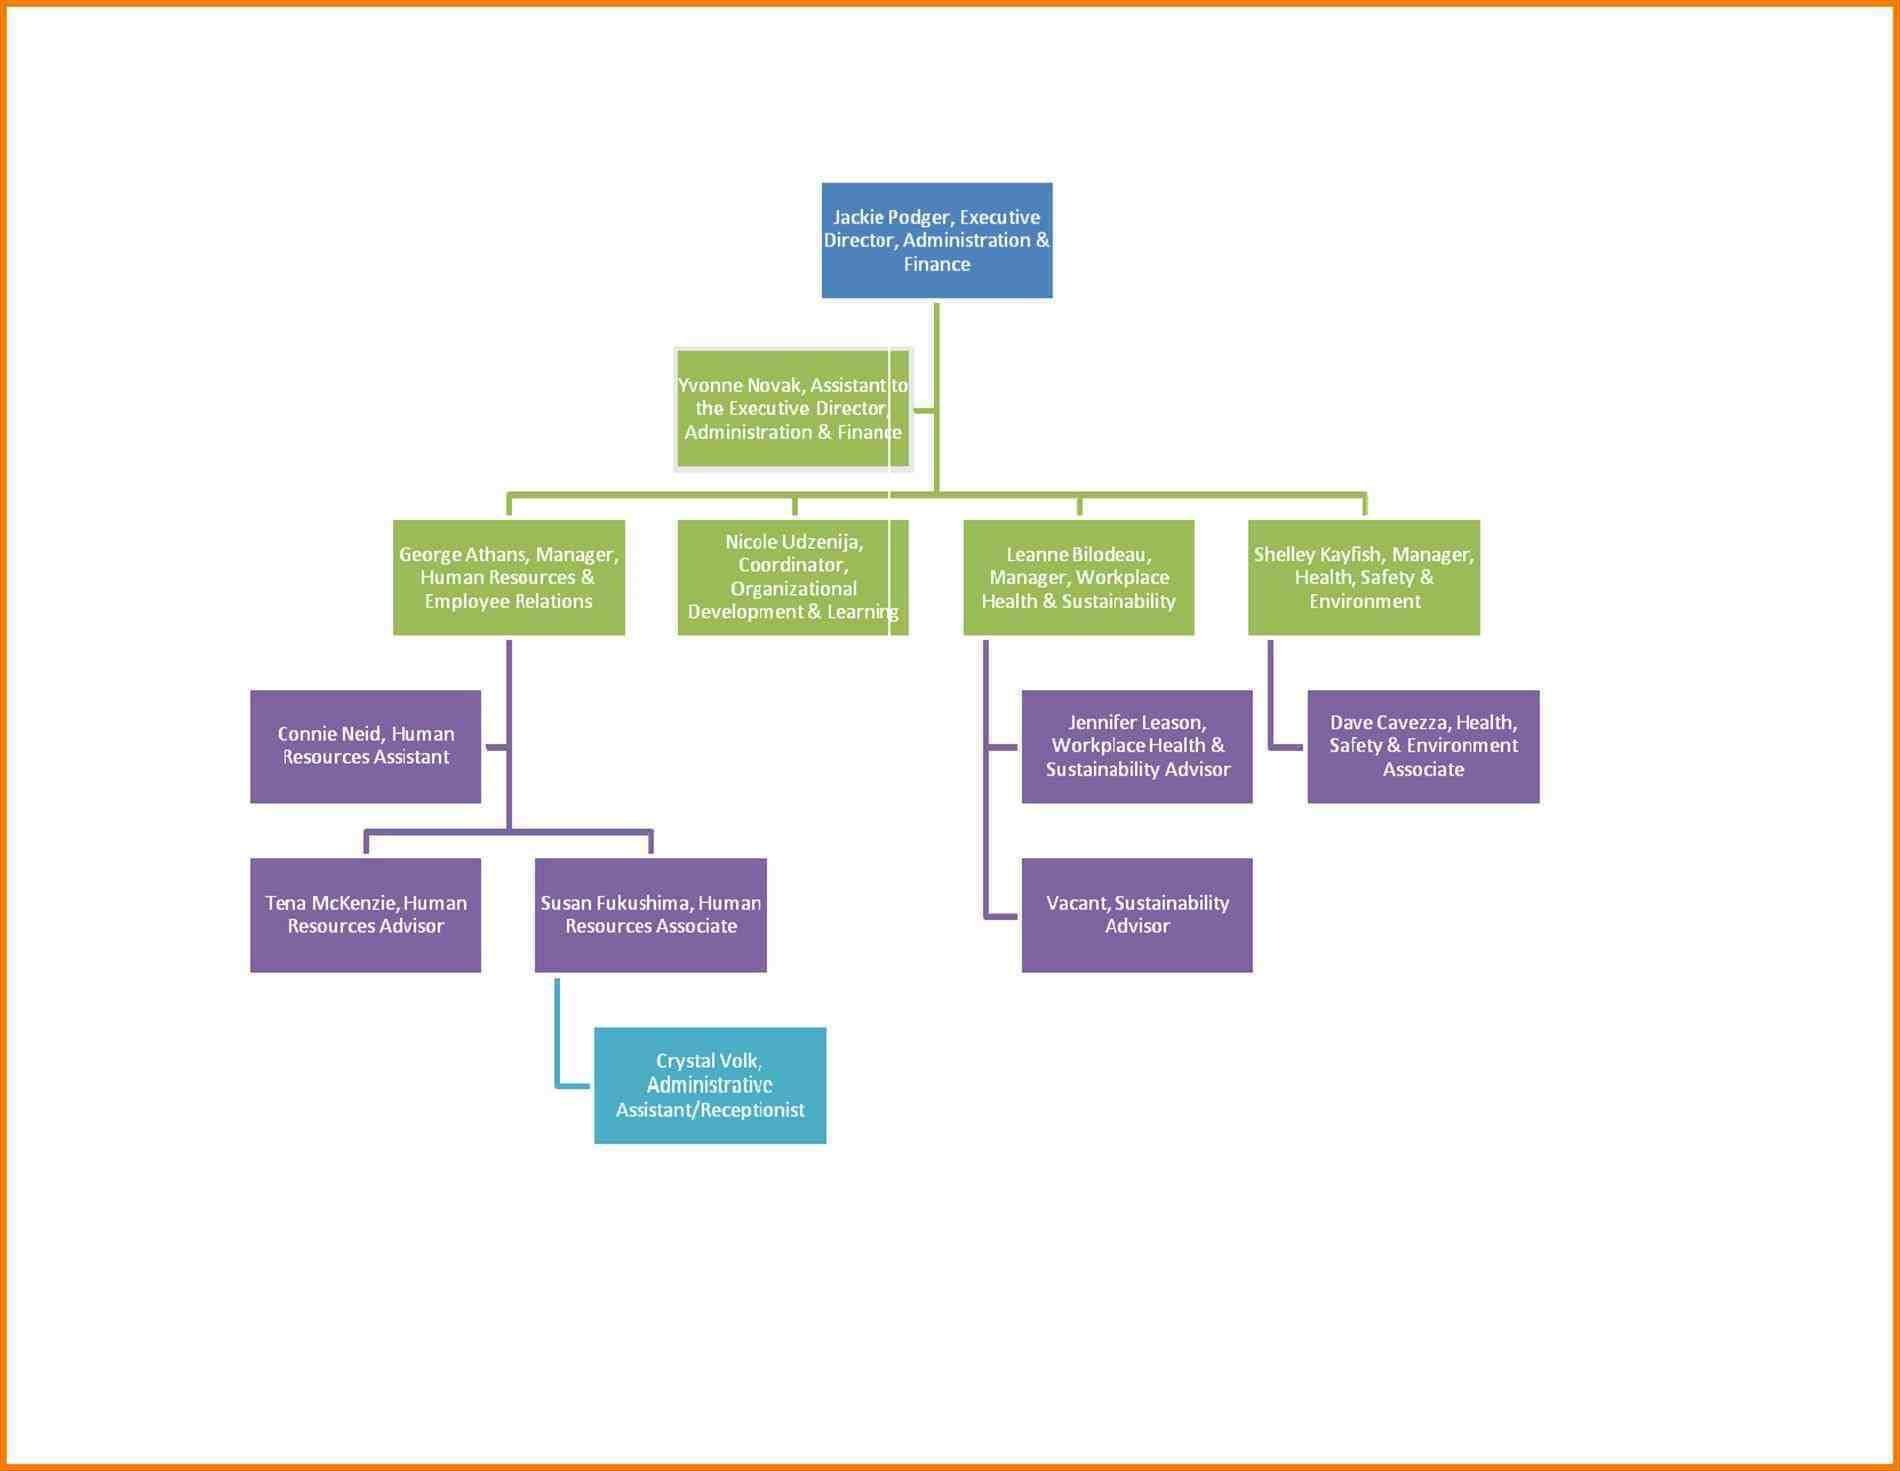 001 Astounding Microsoft Word Organization Chart Template High Definition  Organizational Download 2007Full